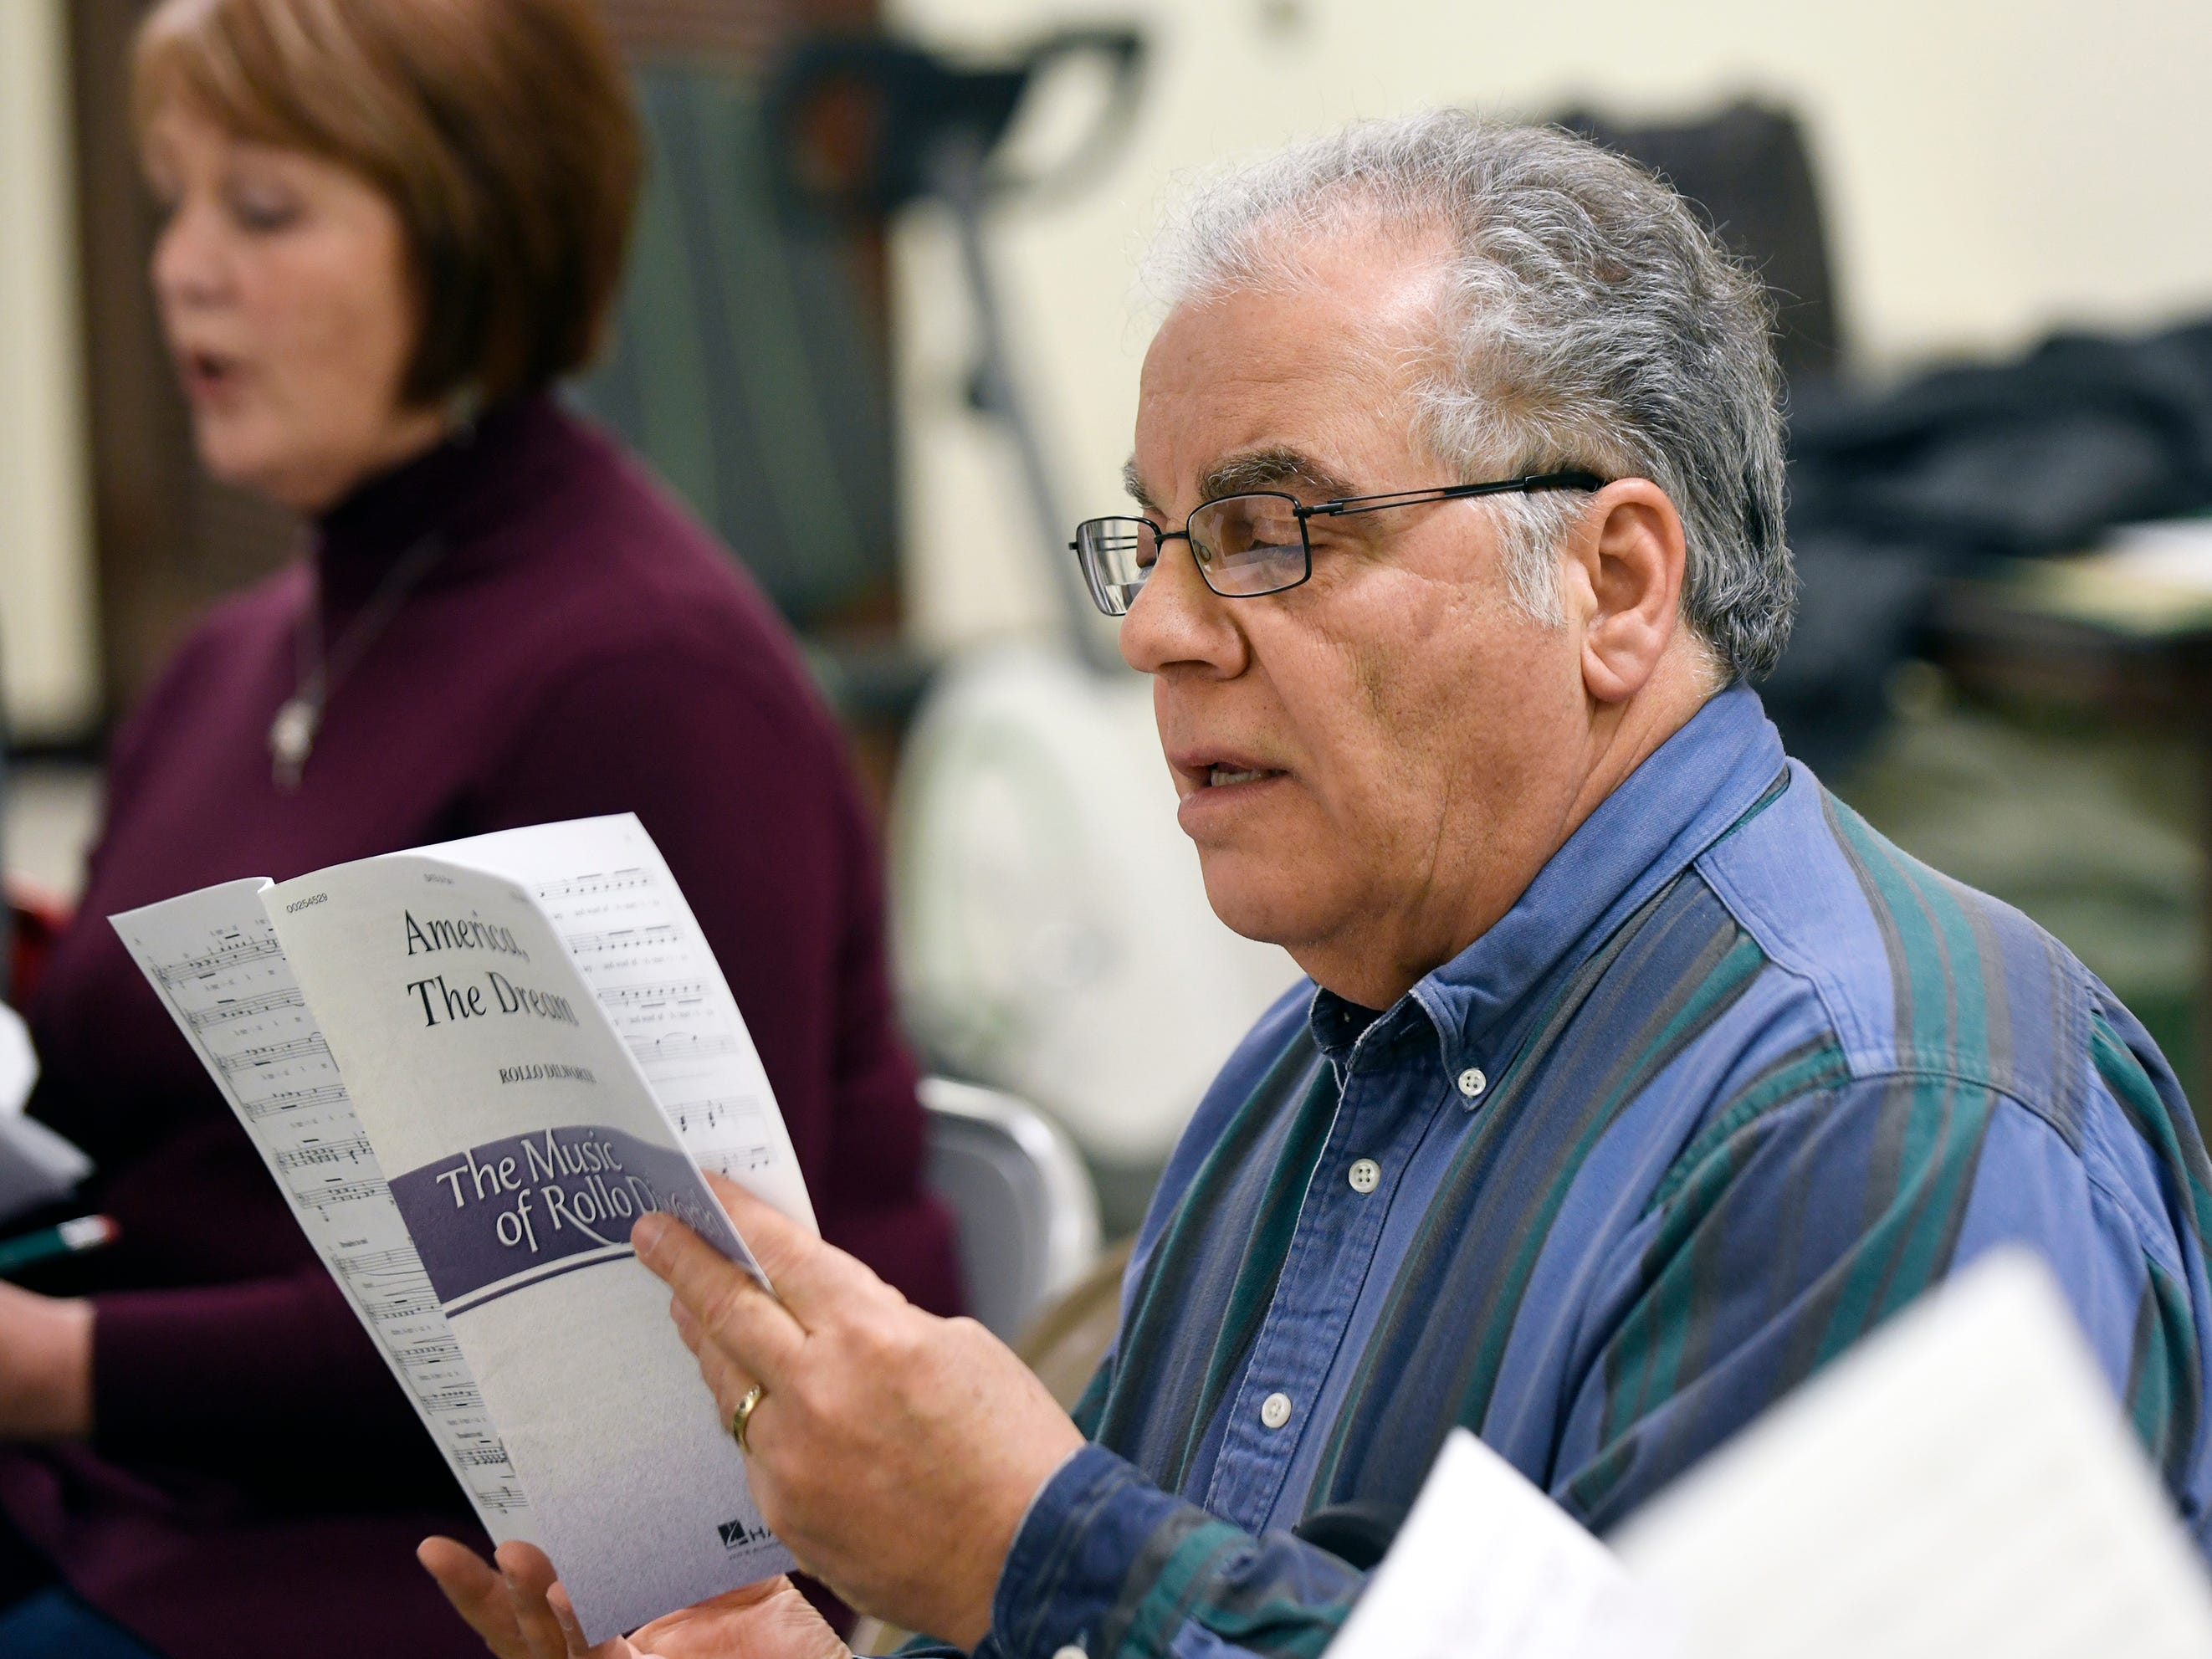 Members of the Singing Ambassadors rehearse at the Vineland Senior Center on Monday, April 1, 2019.